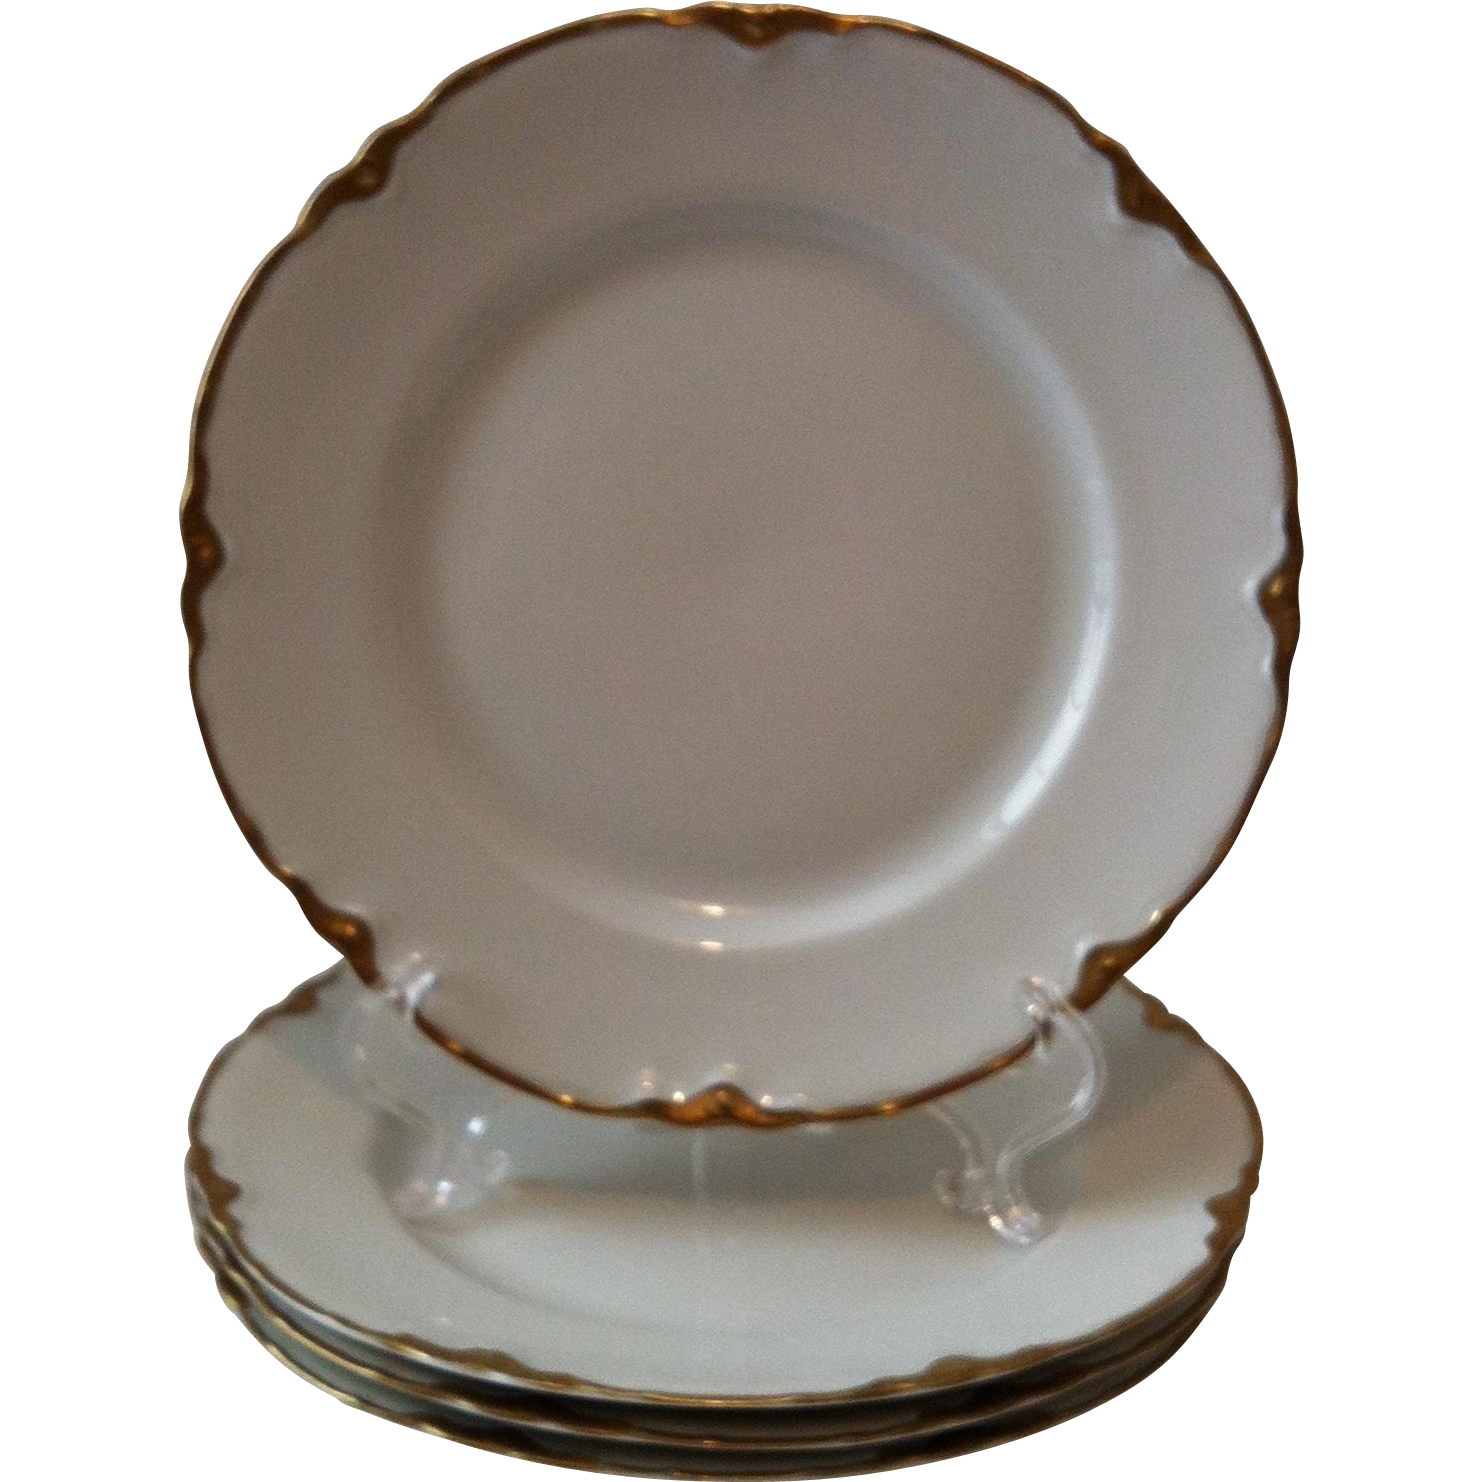 4 Dessert Plates Chateau by Warwick # 2100/1202